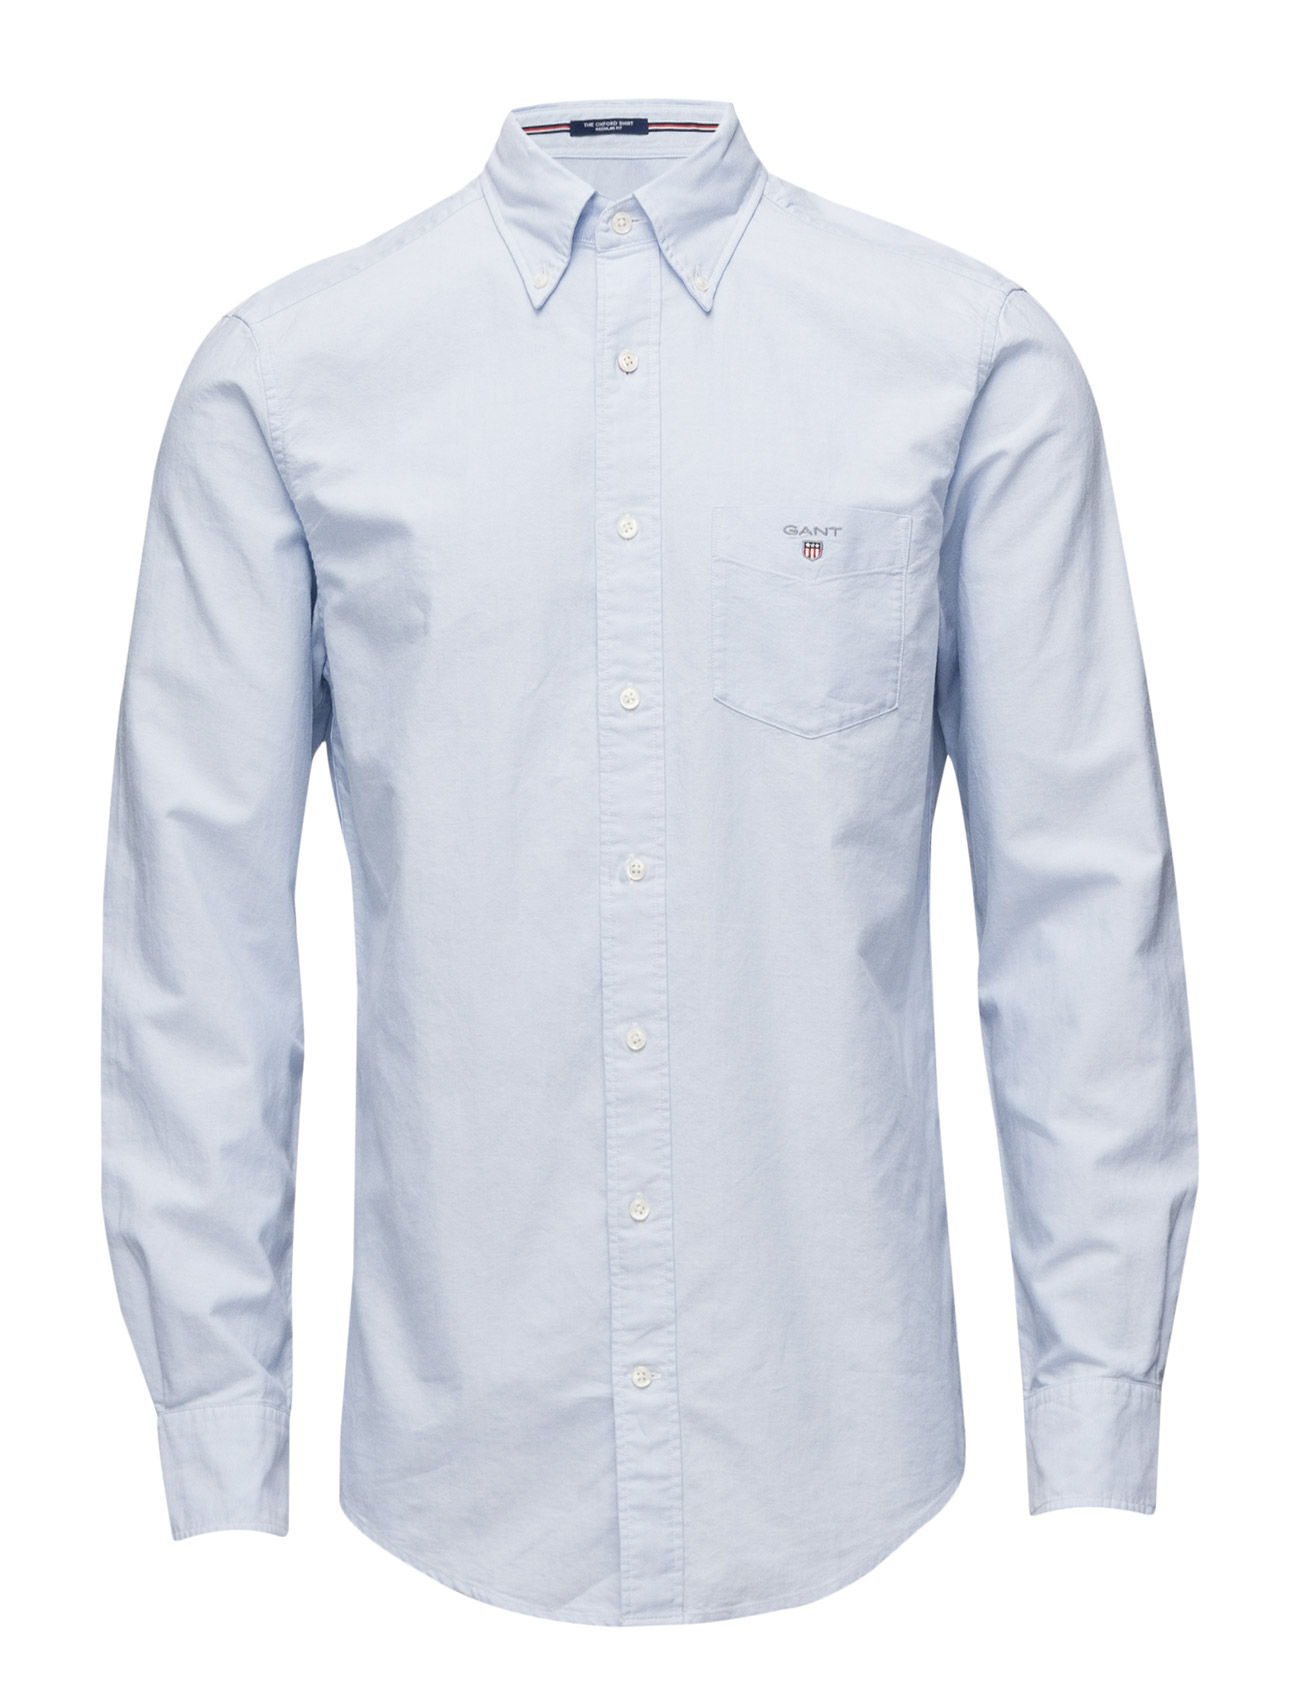 The Oxford Shirt Reg Bd GANT Casual sko til Herrer i